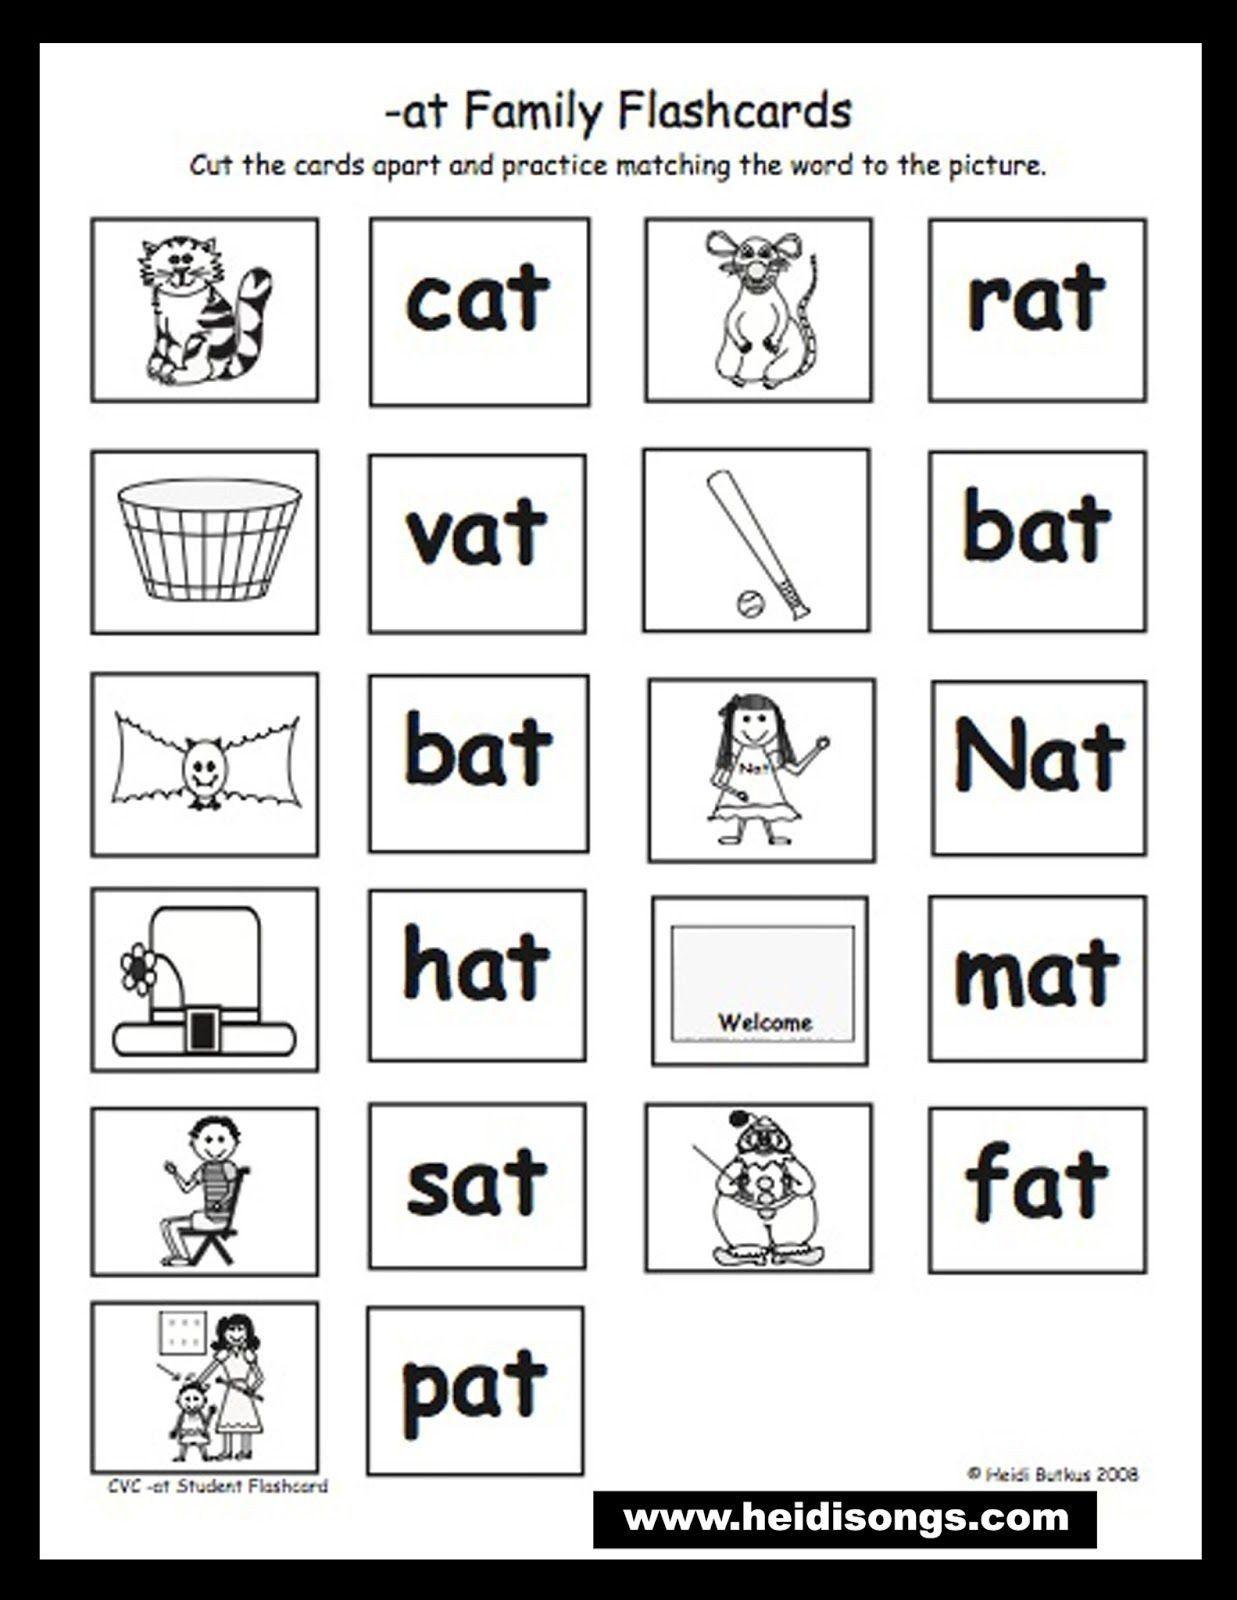 Cvc Worksheet Kindergarten Cat Mat Sat Worksheet In